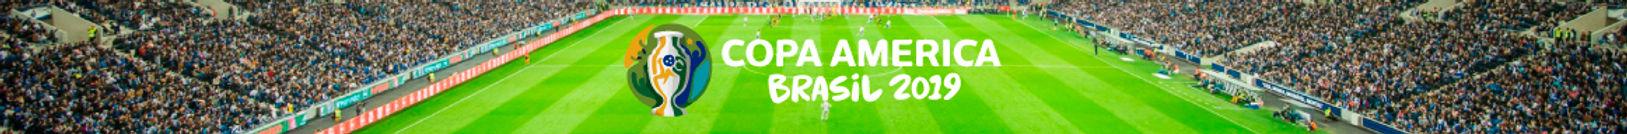 Copa-América-29.04.19.jpg